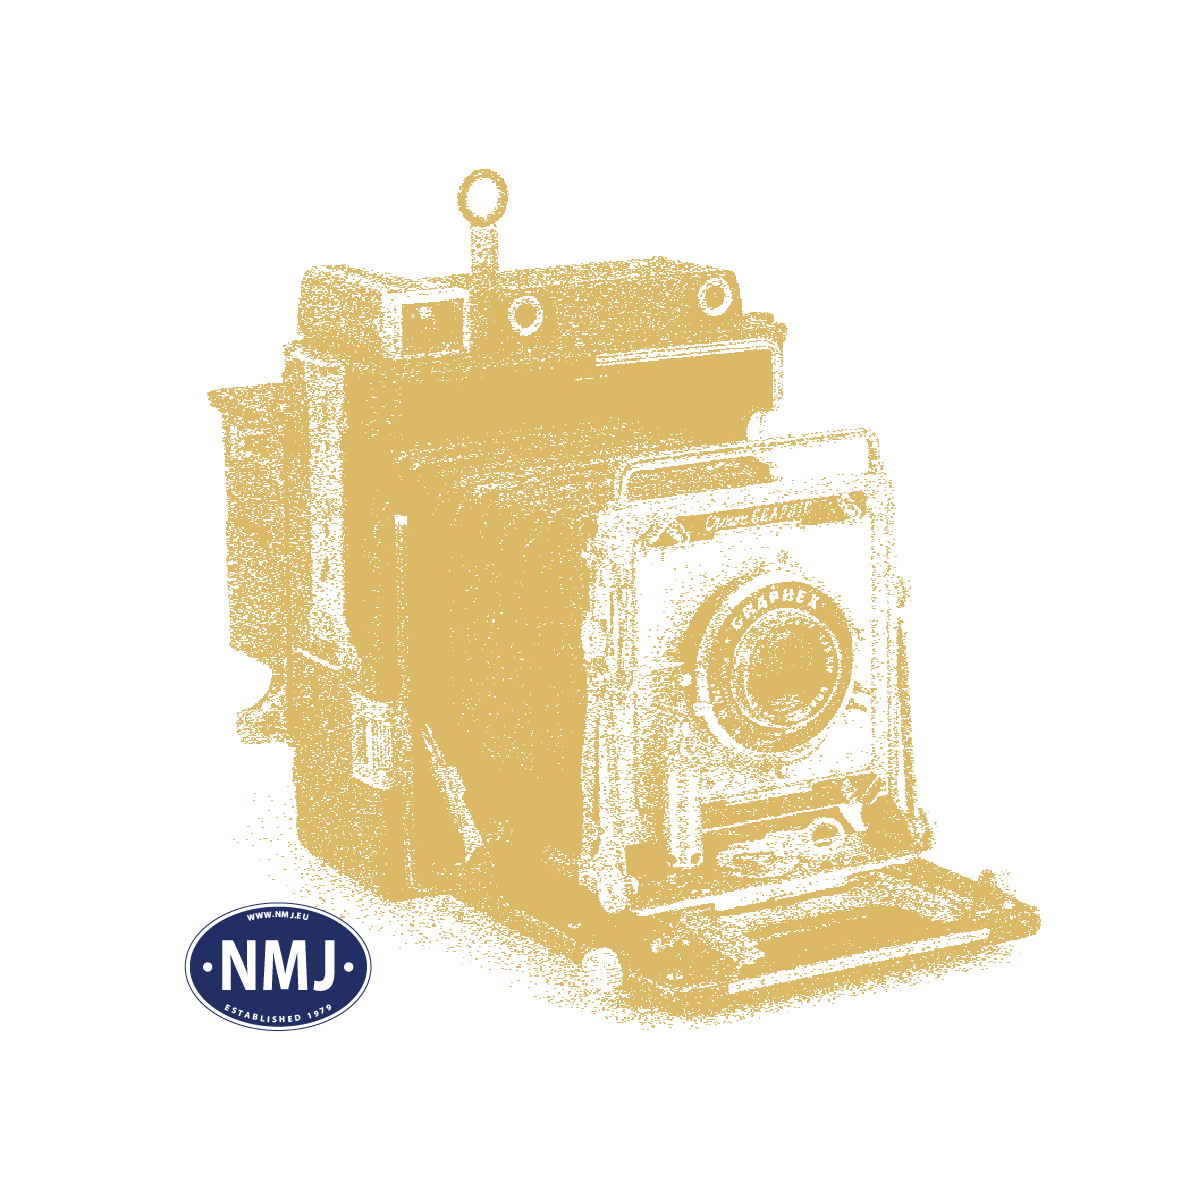 NMJT502.303 - NMJ Topline Kpbs 21 76 335 741-0 Rungenwagen NSB mit Beladung